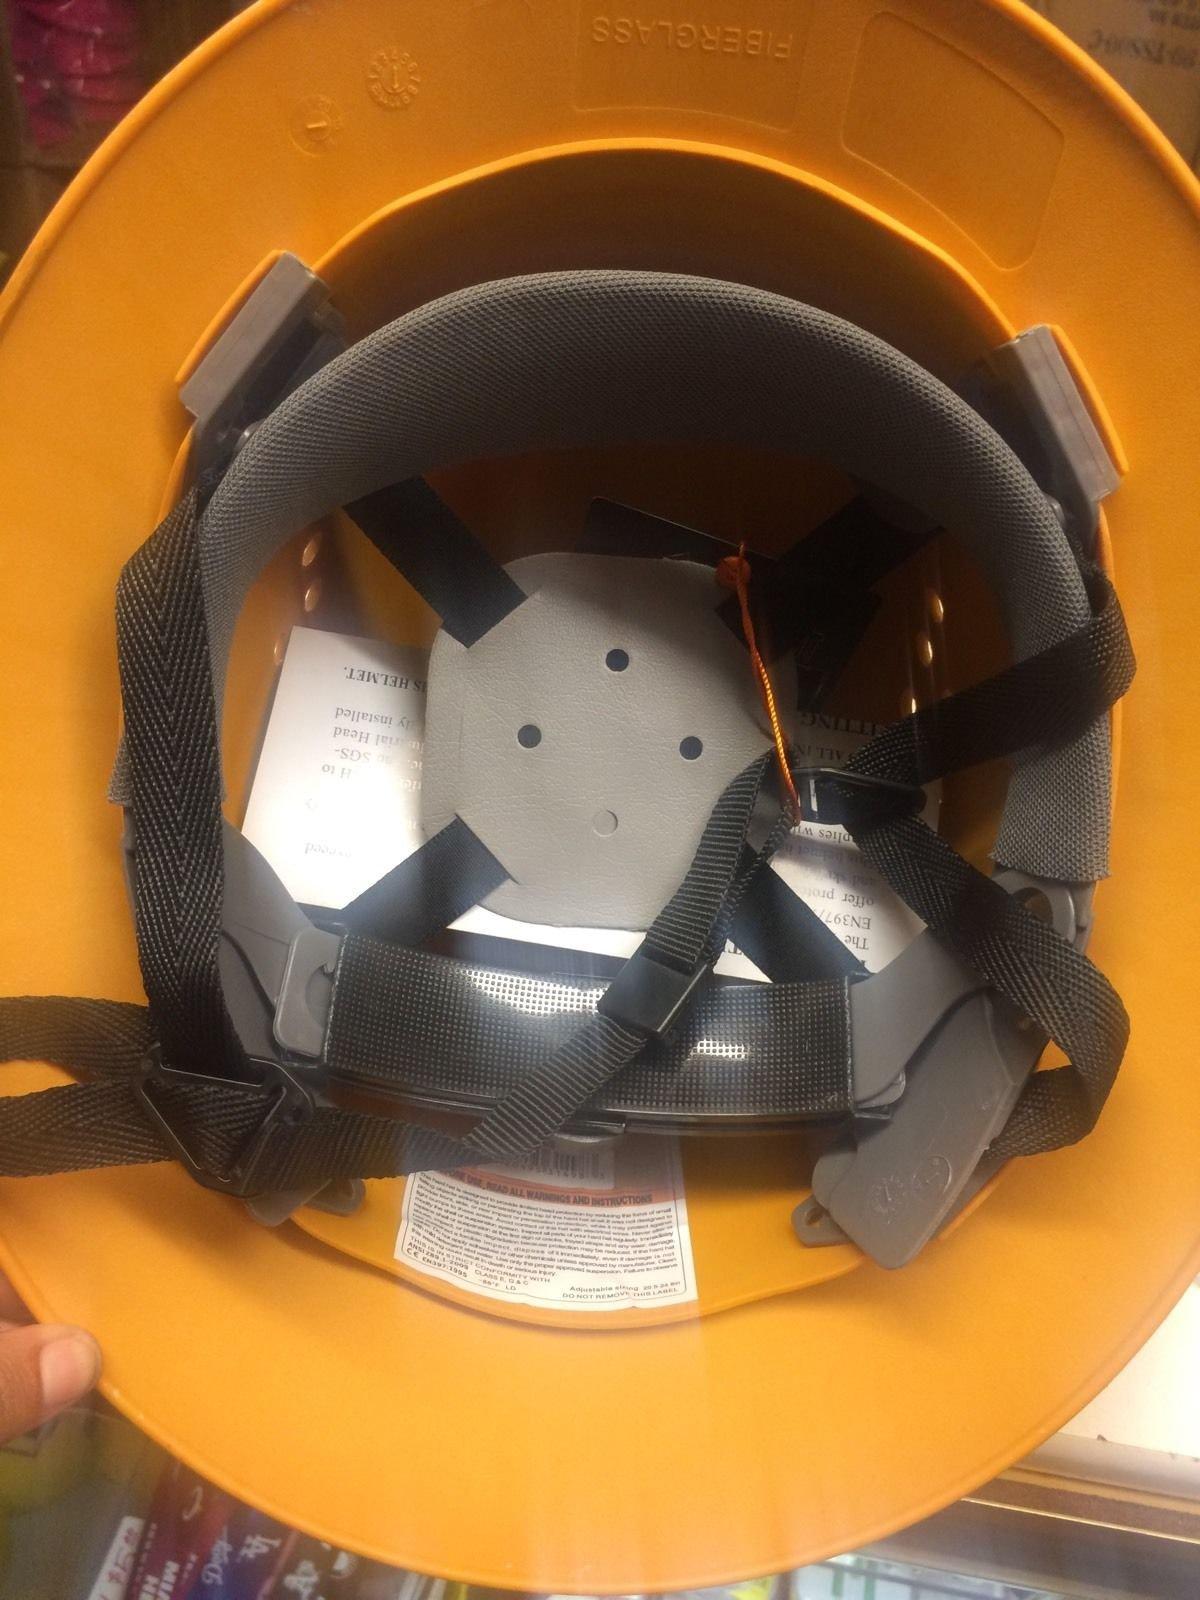 HNTE-TAN Fiberglass Hard Hat Safety Full Brim Helmet, Nylon Ratchet Suspension, 4-Point, {Top Impact} Safety Hard Hat Cool Air Flow Vent System by Truecrest Safety Helmet (Image #4)